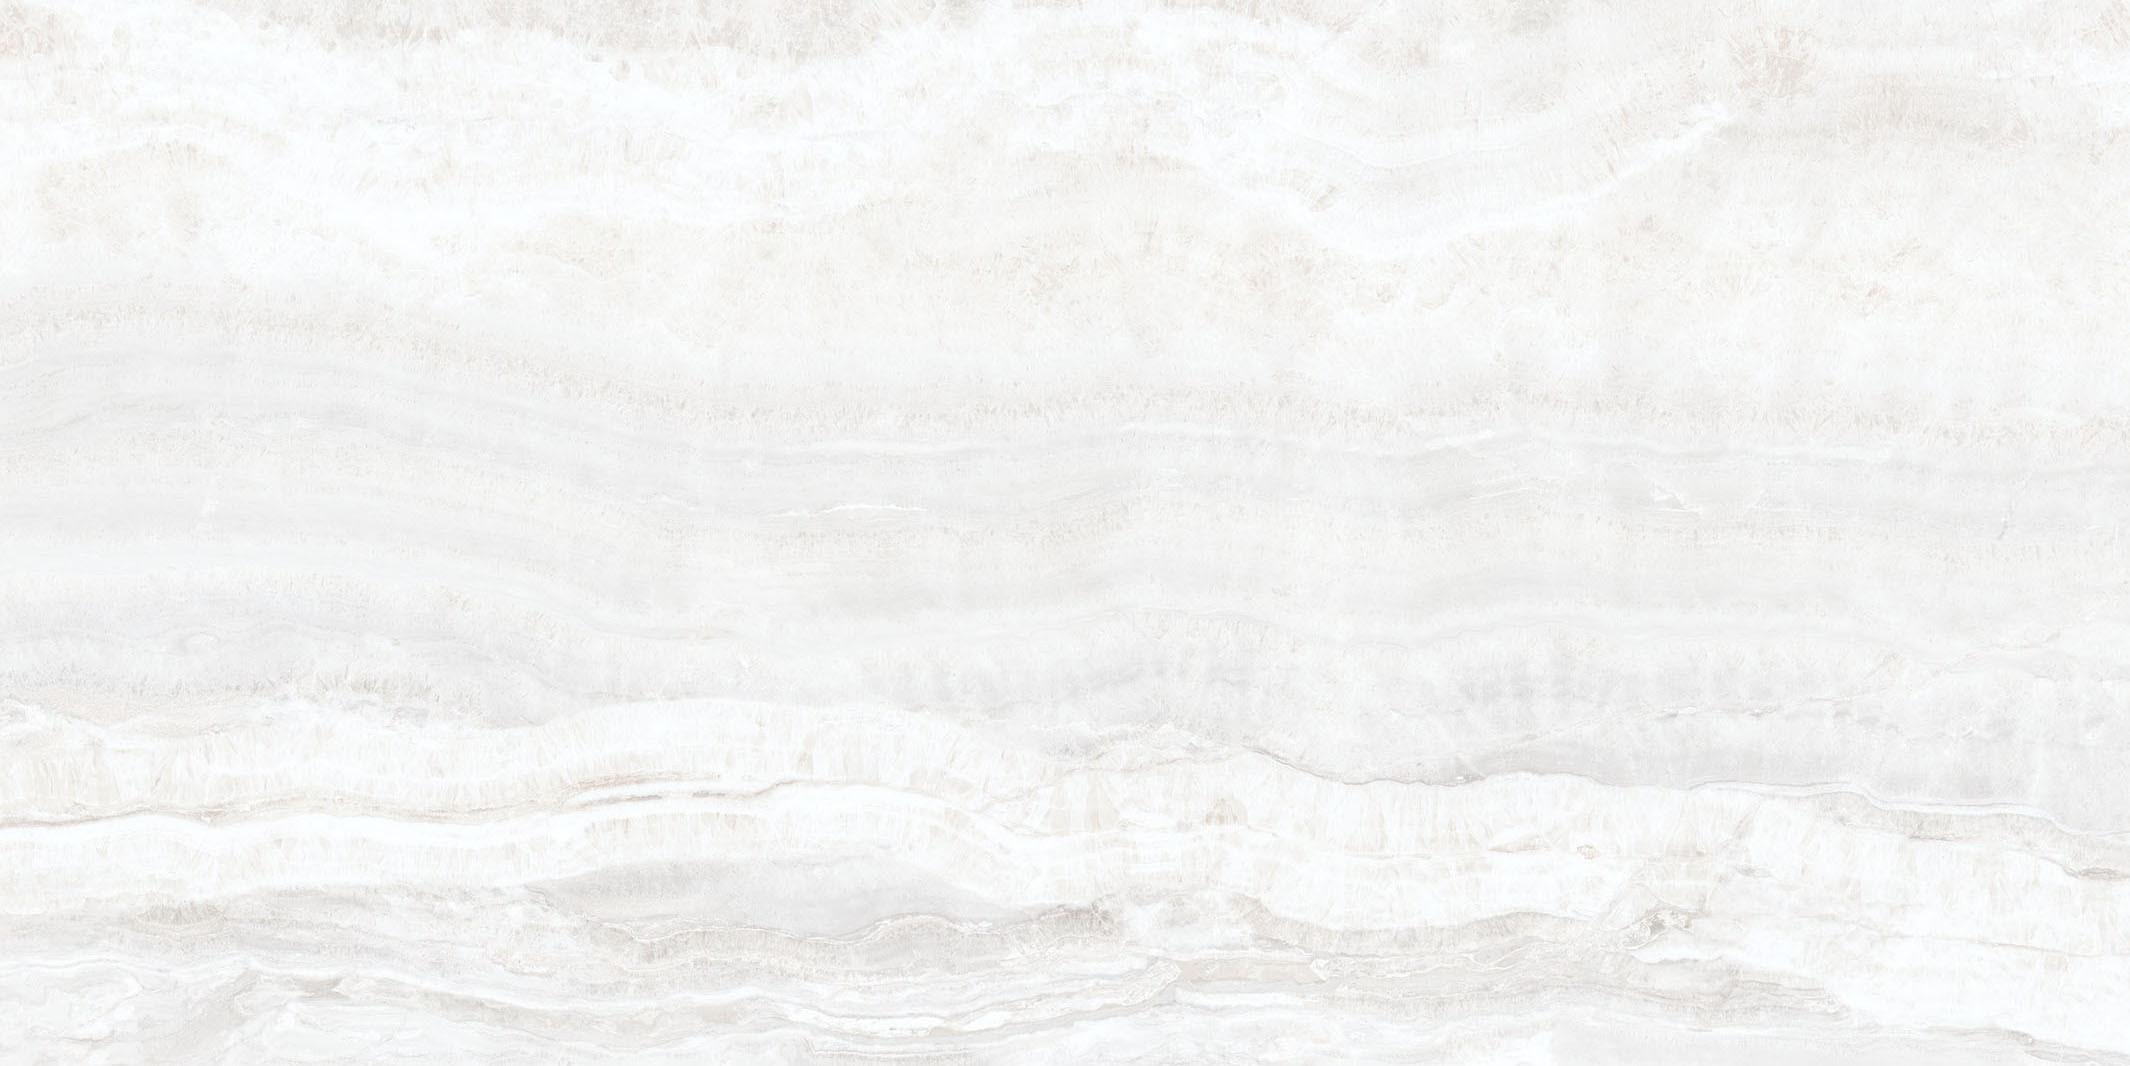 Onyx of Cerim White Glossy 10mm 60 x 120